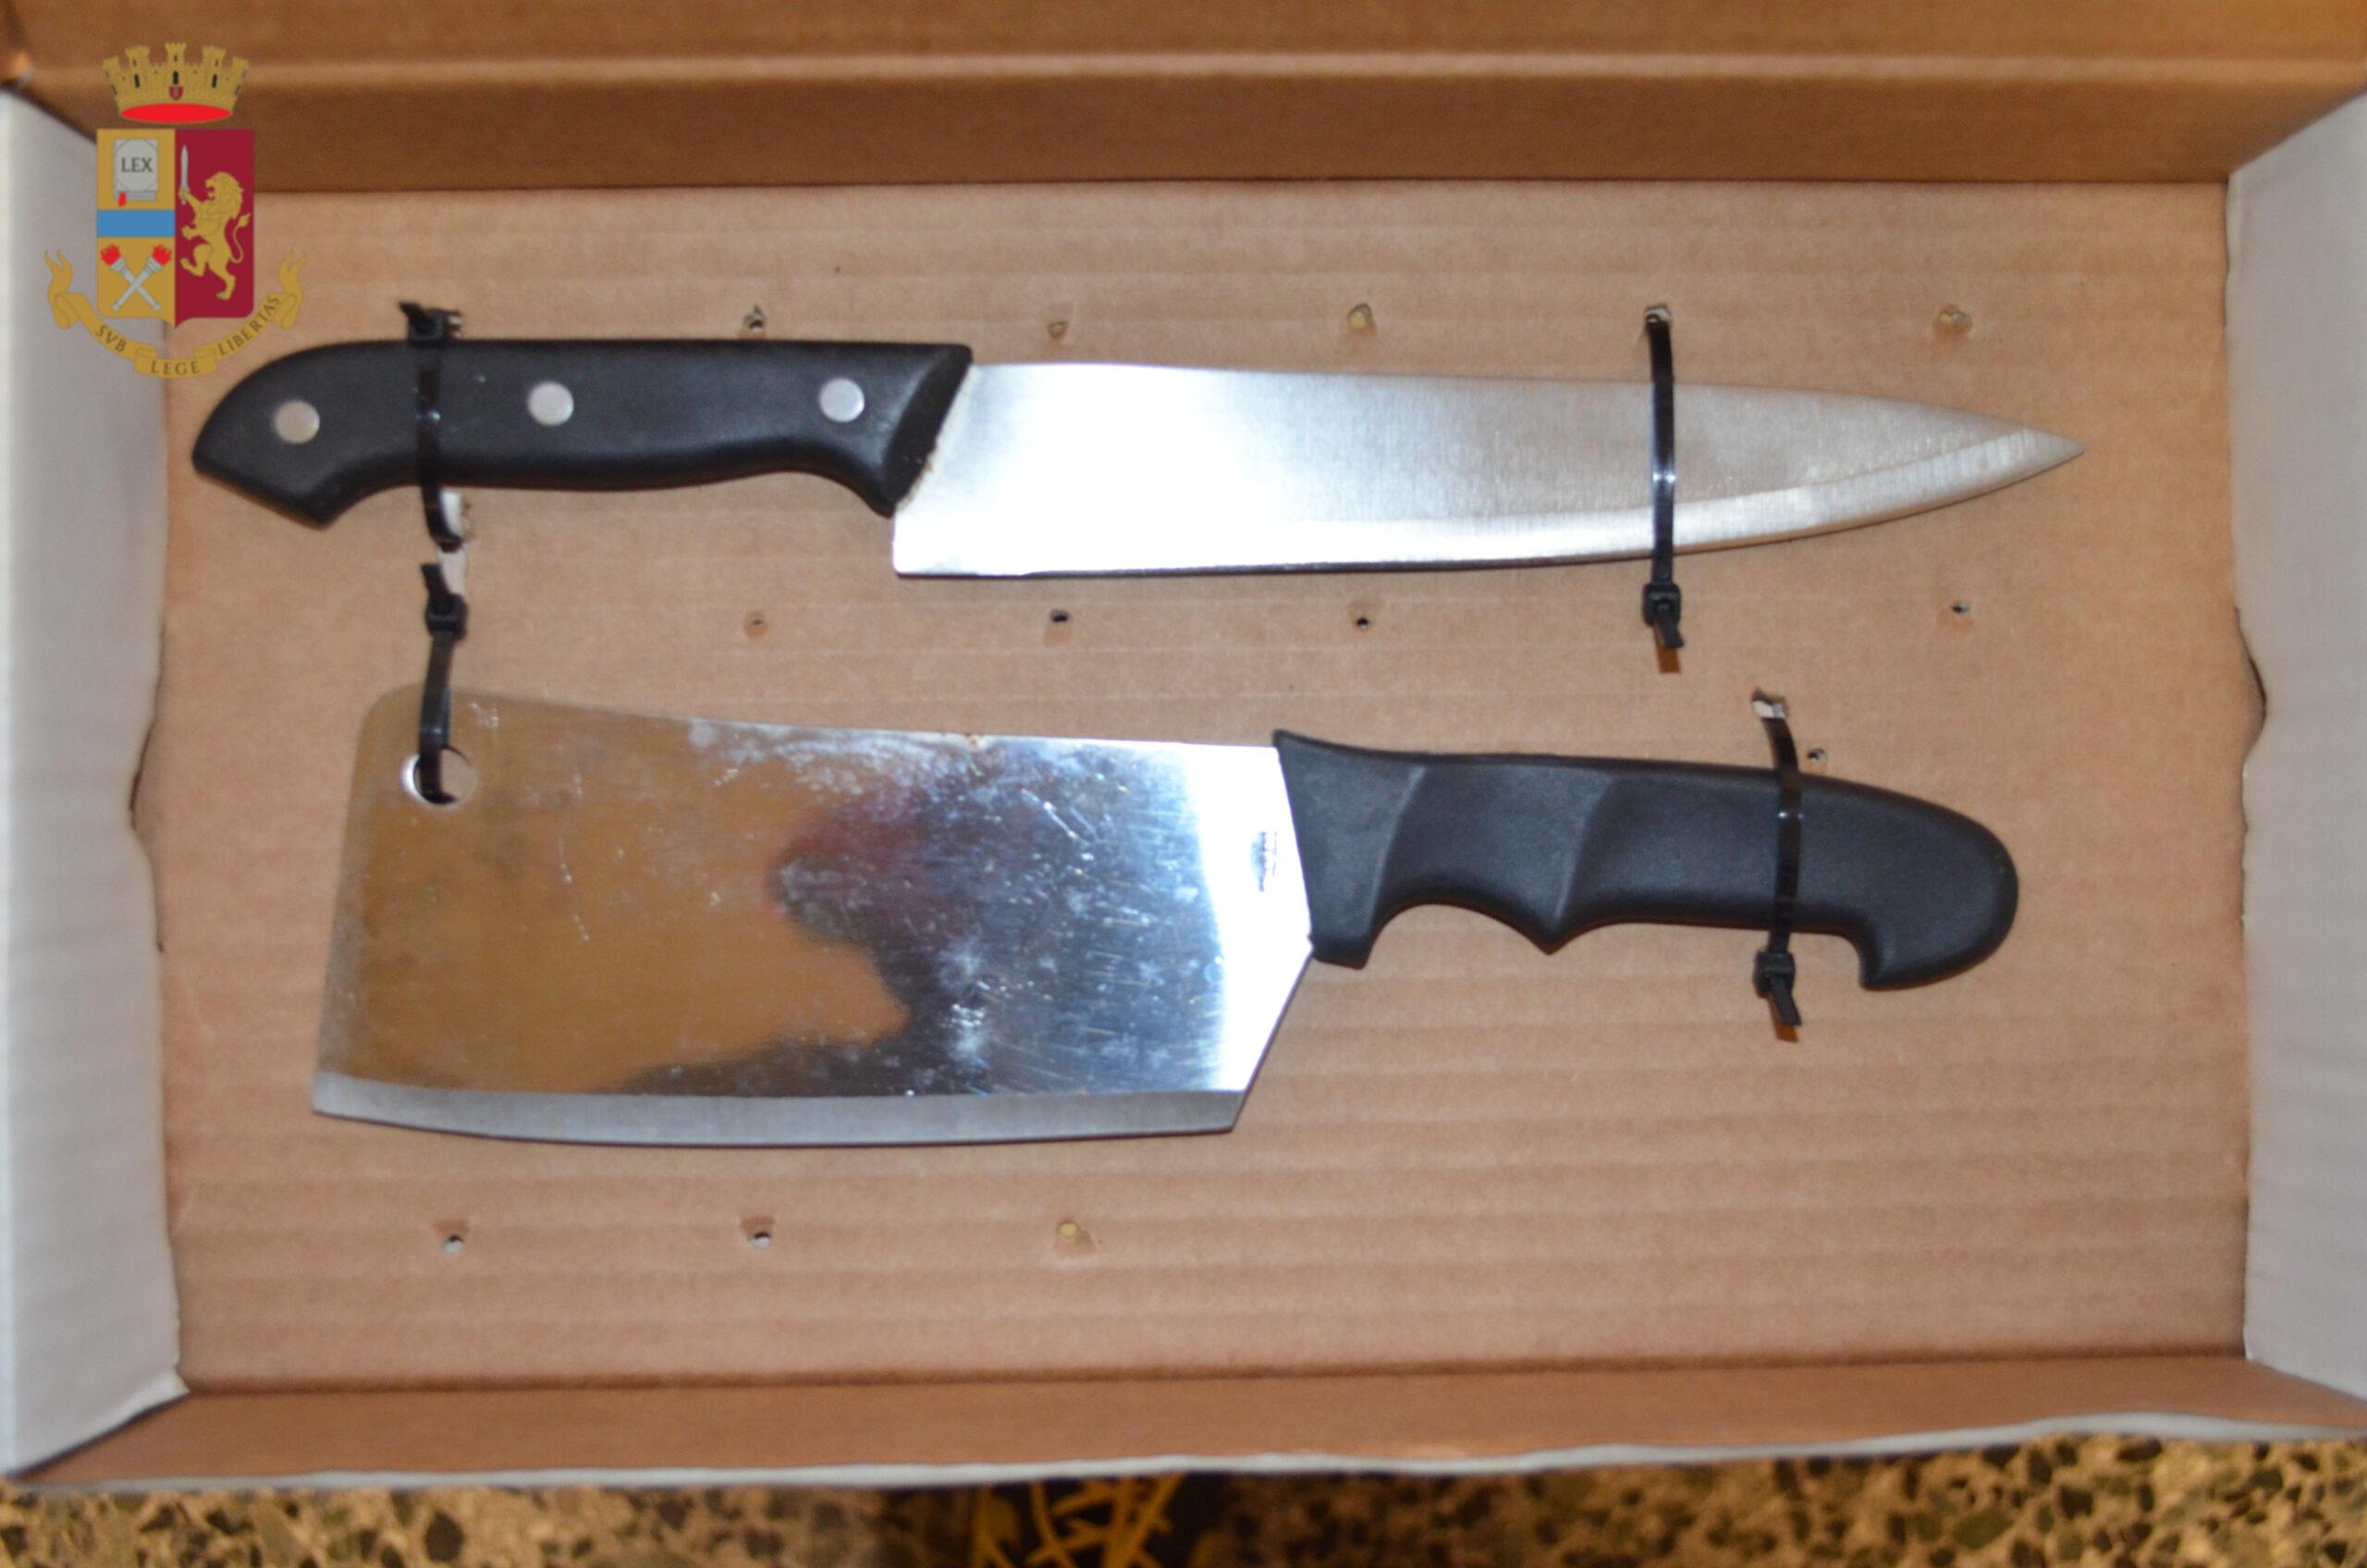 coltelli in macchina a velletri